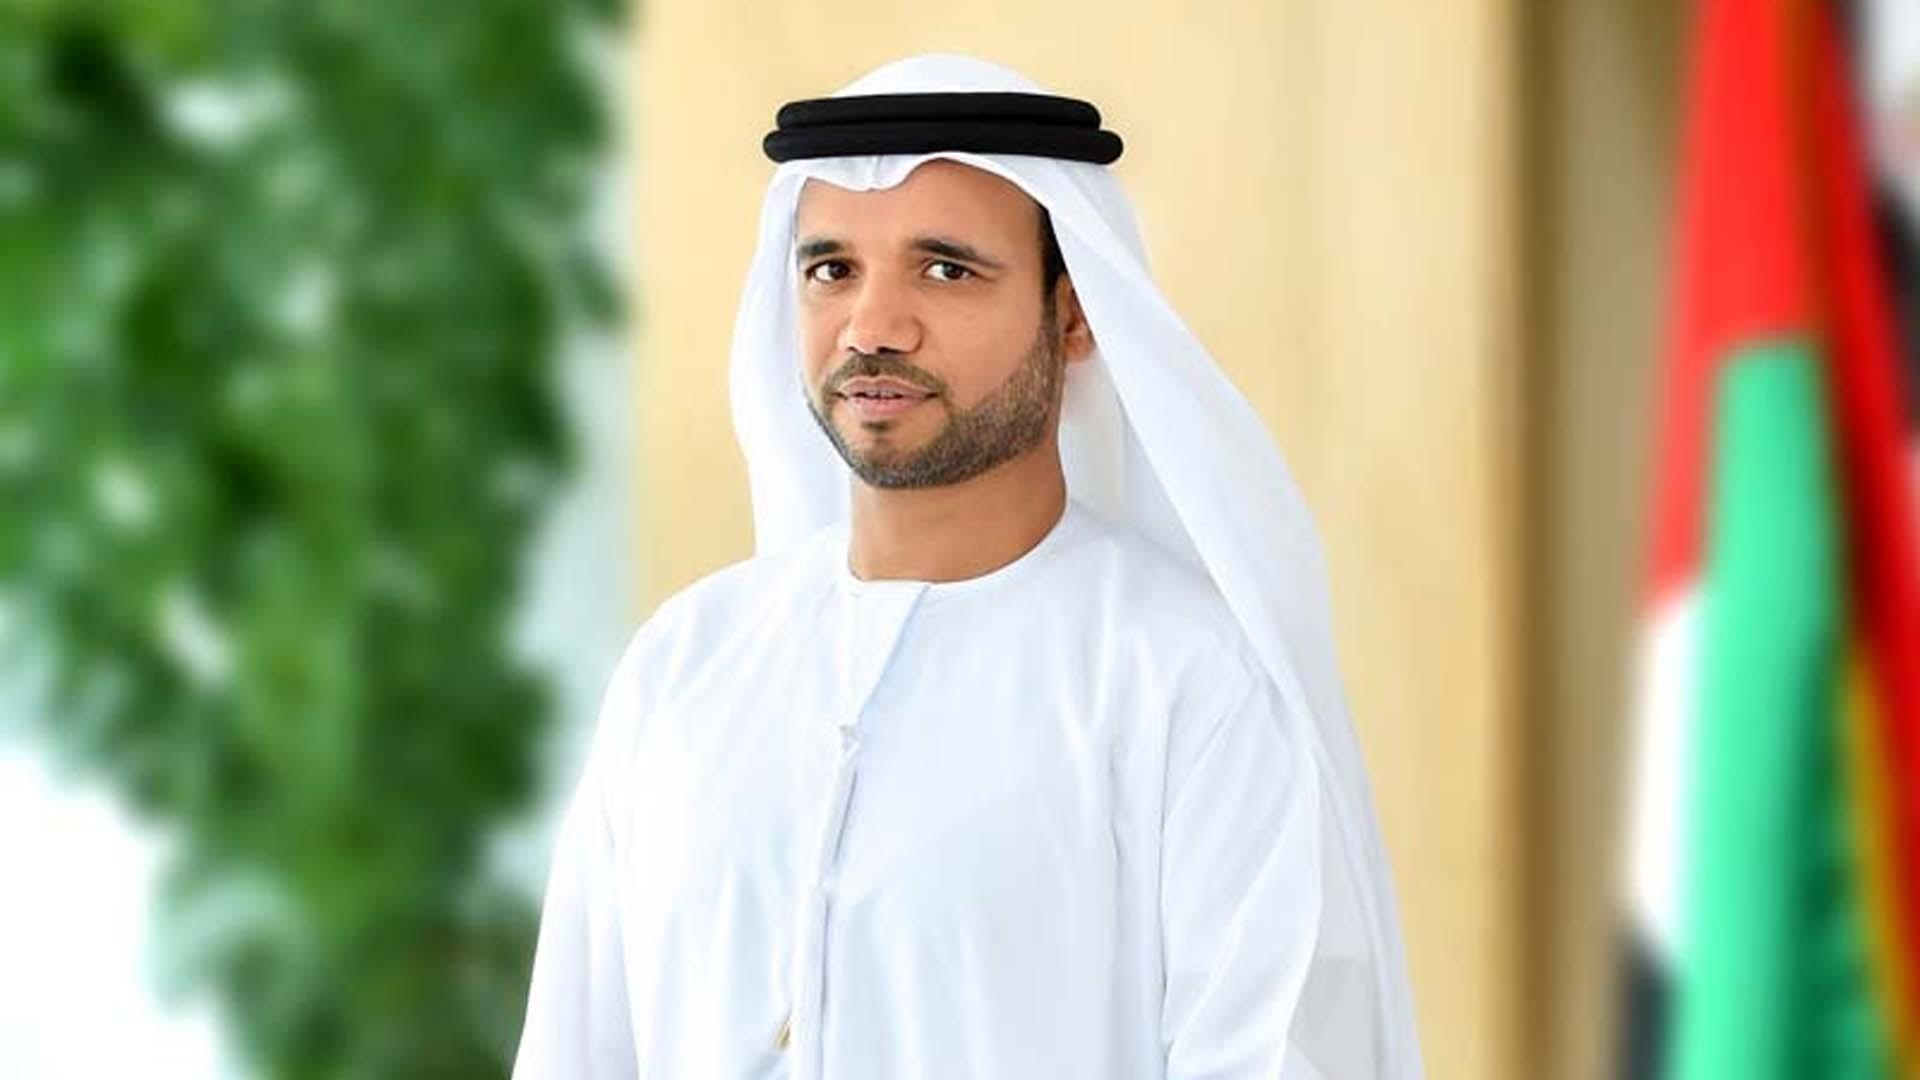 Agthia Group PJSC Appoints His Excellency Engineer Jamal Salem Al Dhaheri As Group's Acting CEO